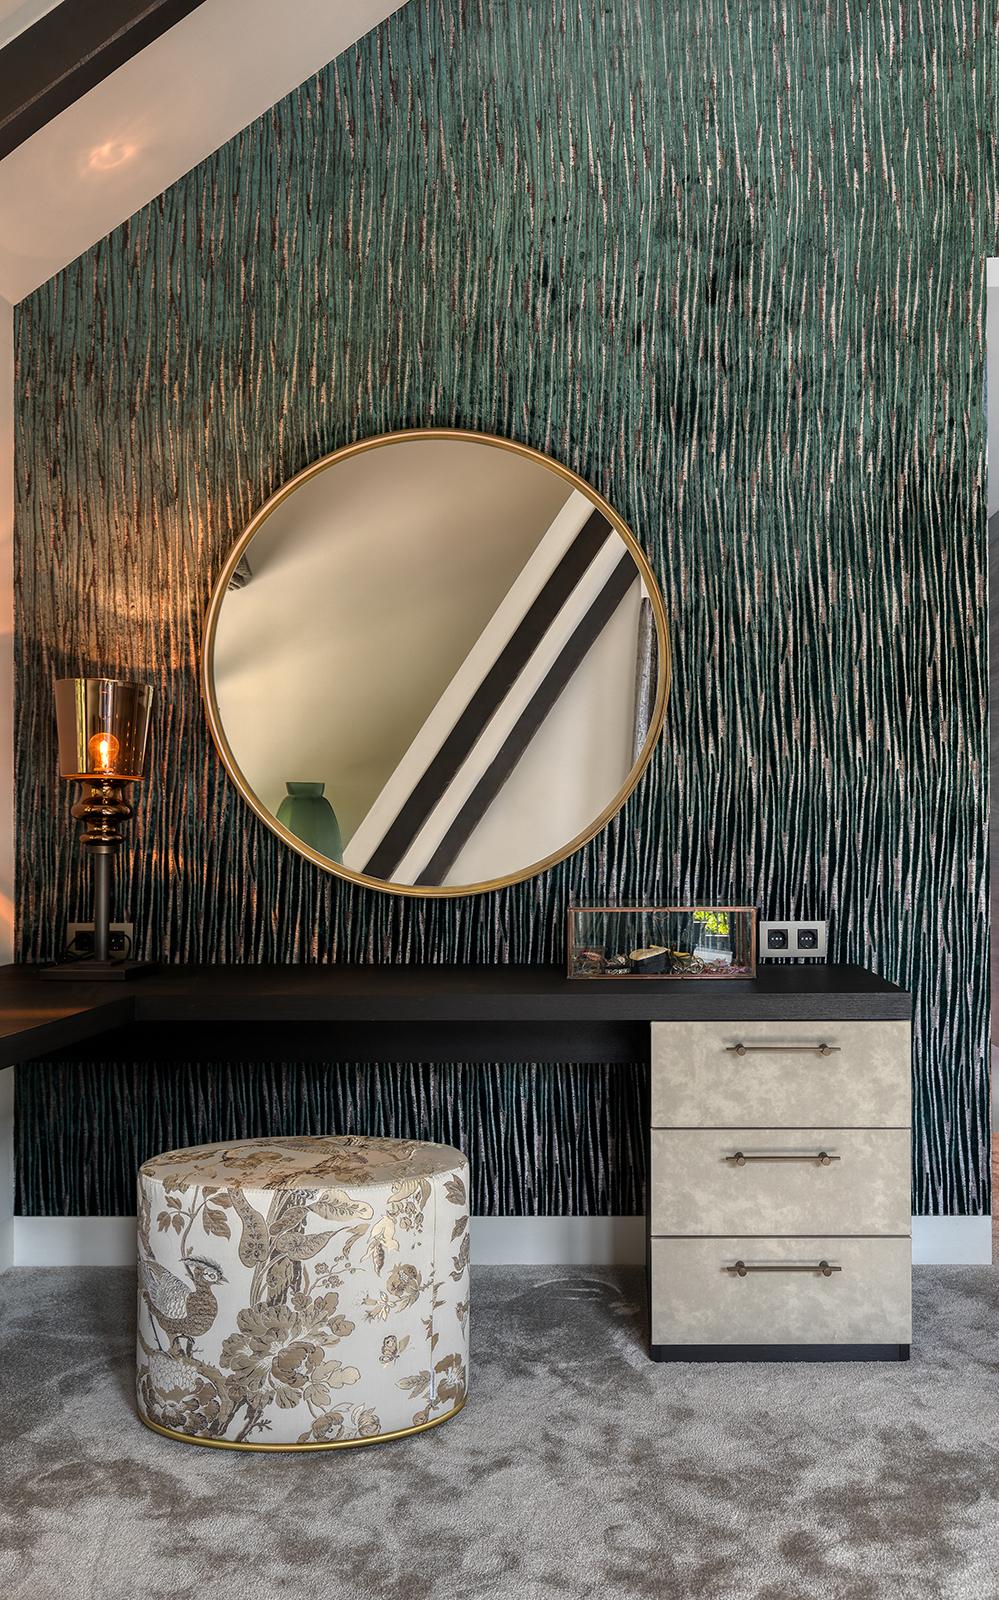 wandtextiel, Dutch Walltextile Company, wandbekleding, wanddecoratie